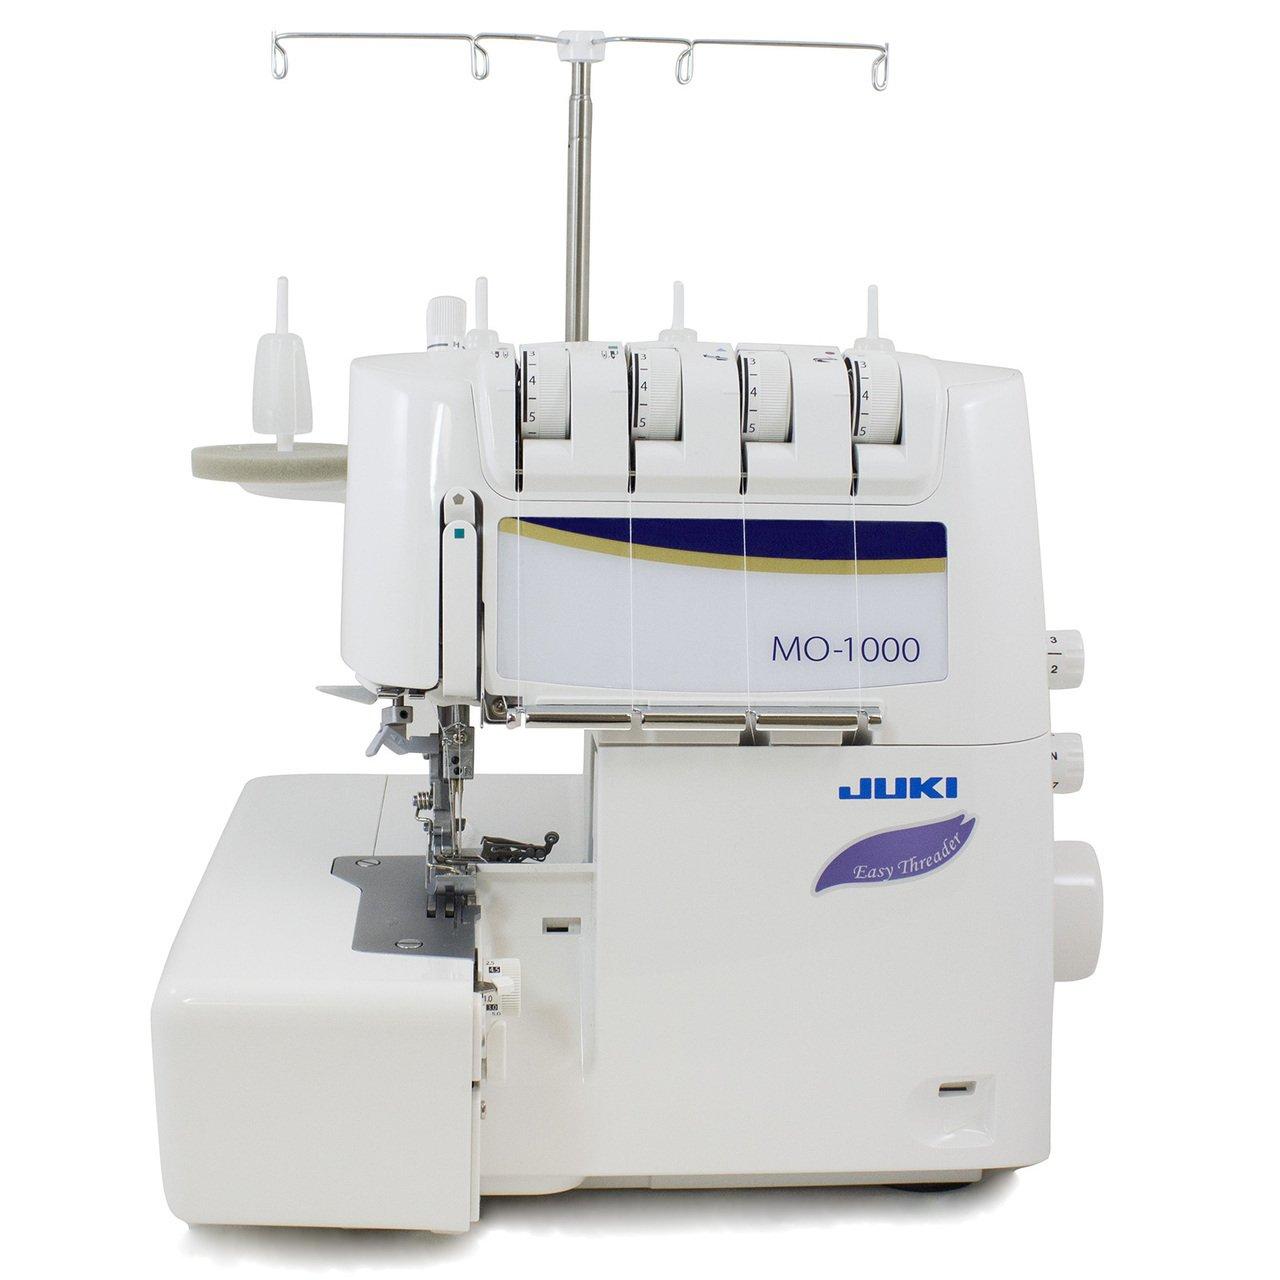 MO-1000